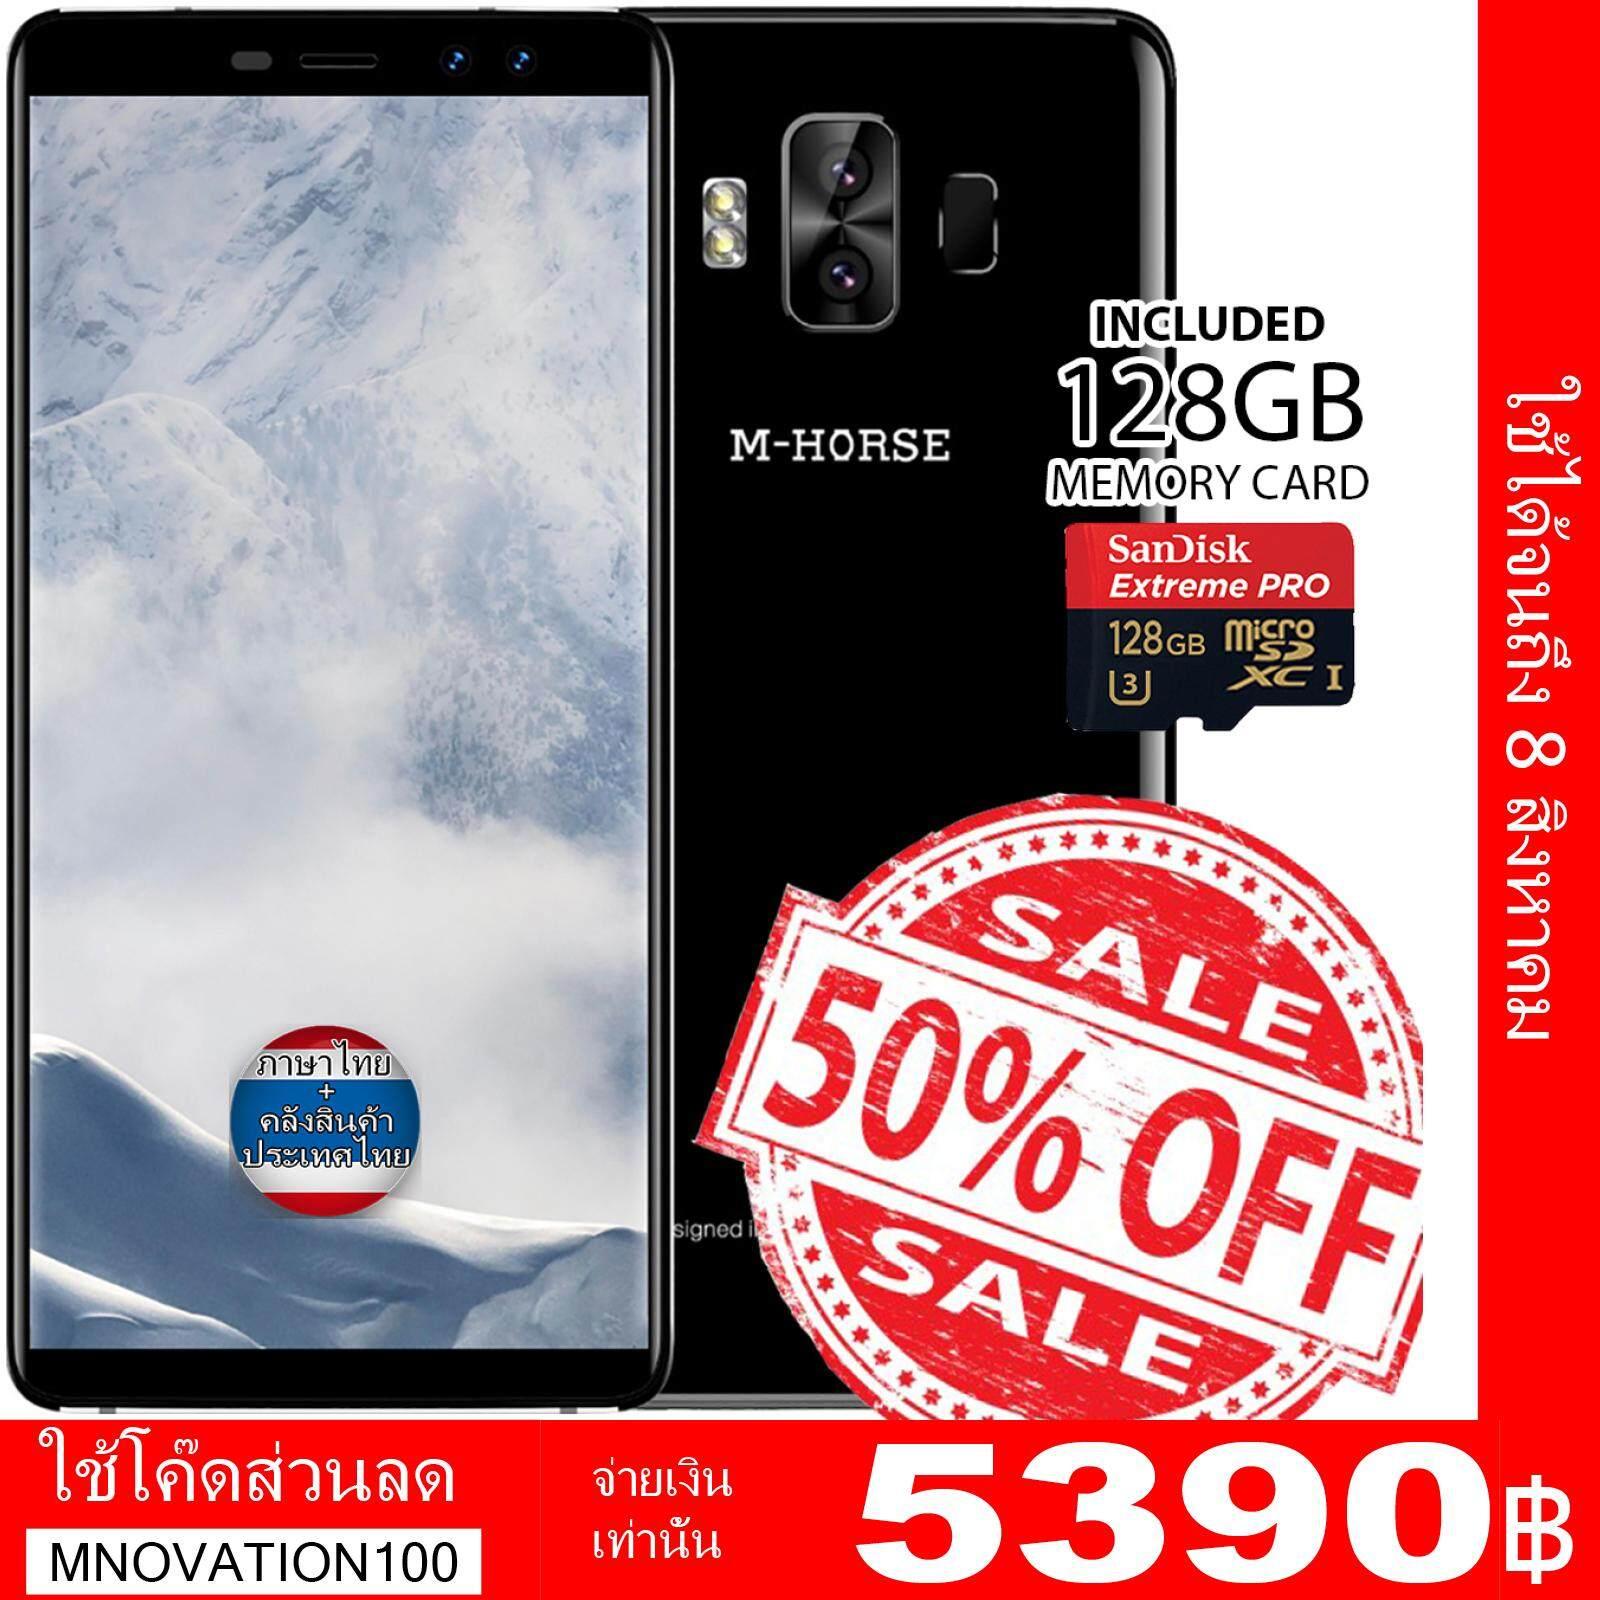 288GB+3GB แบต2วัน ลายนิ้วมือ กล้องคู่หน้าSONY 4G LTE 2ซิม HD+จอ M-HORSE Pure 1 32GB ROM สีดำ